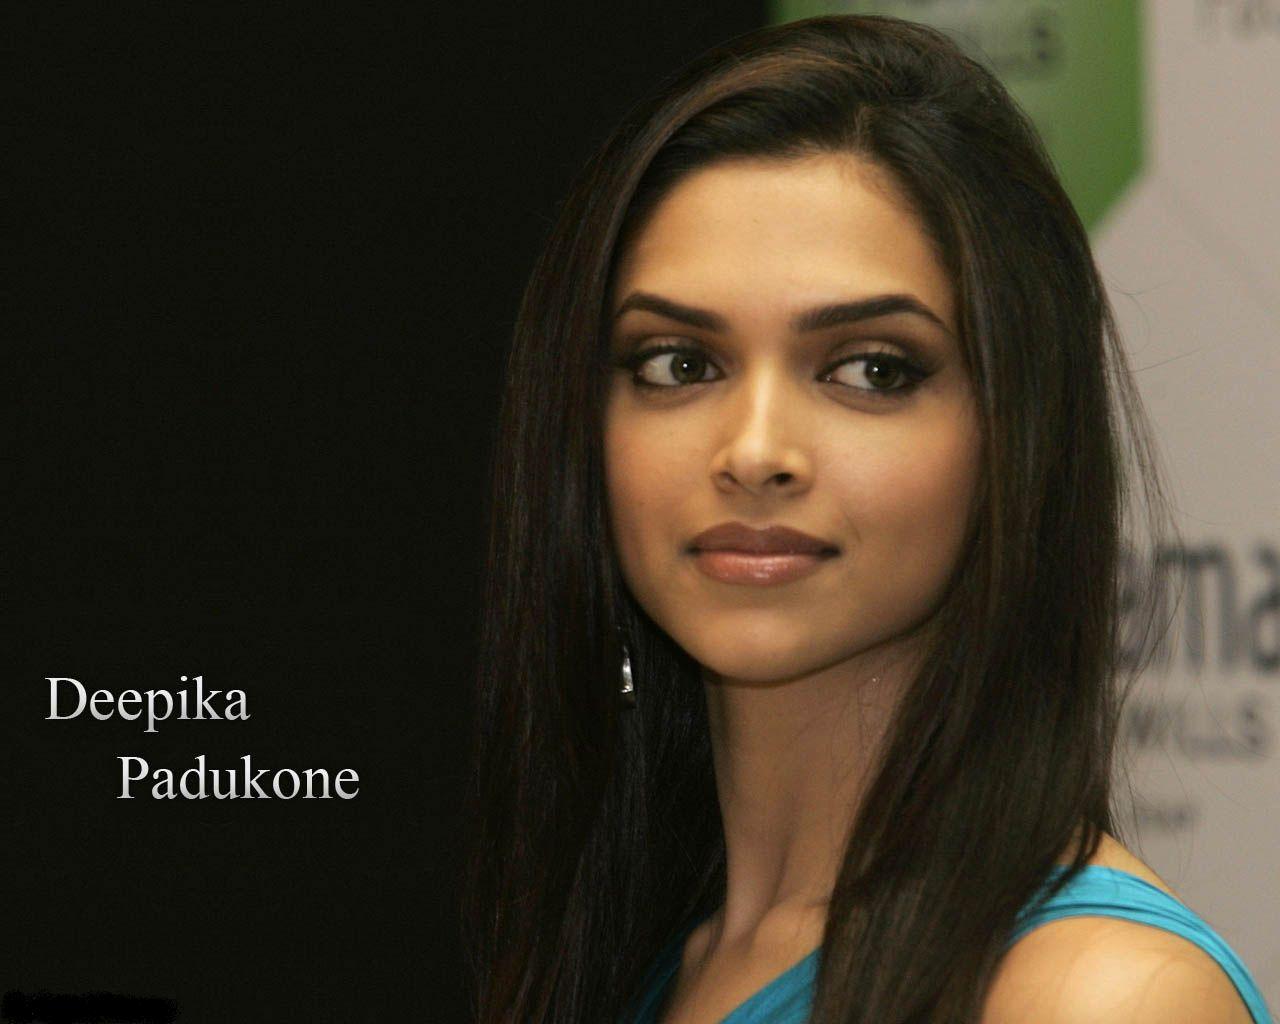 Deepika-padukone-wide-high-definition-wallpaper-for-desktop.